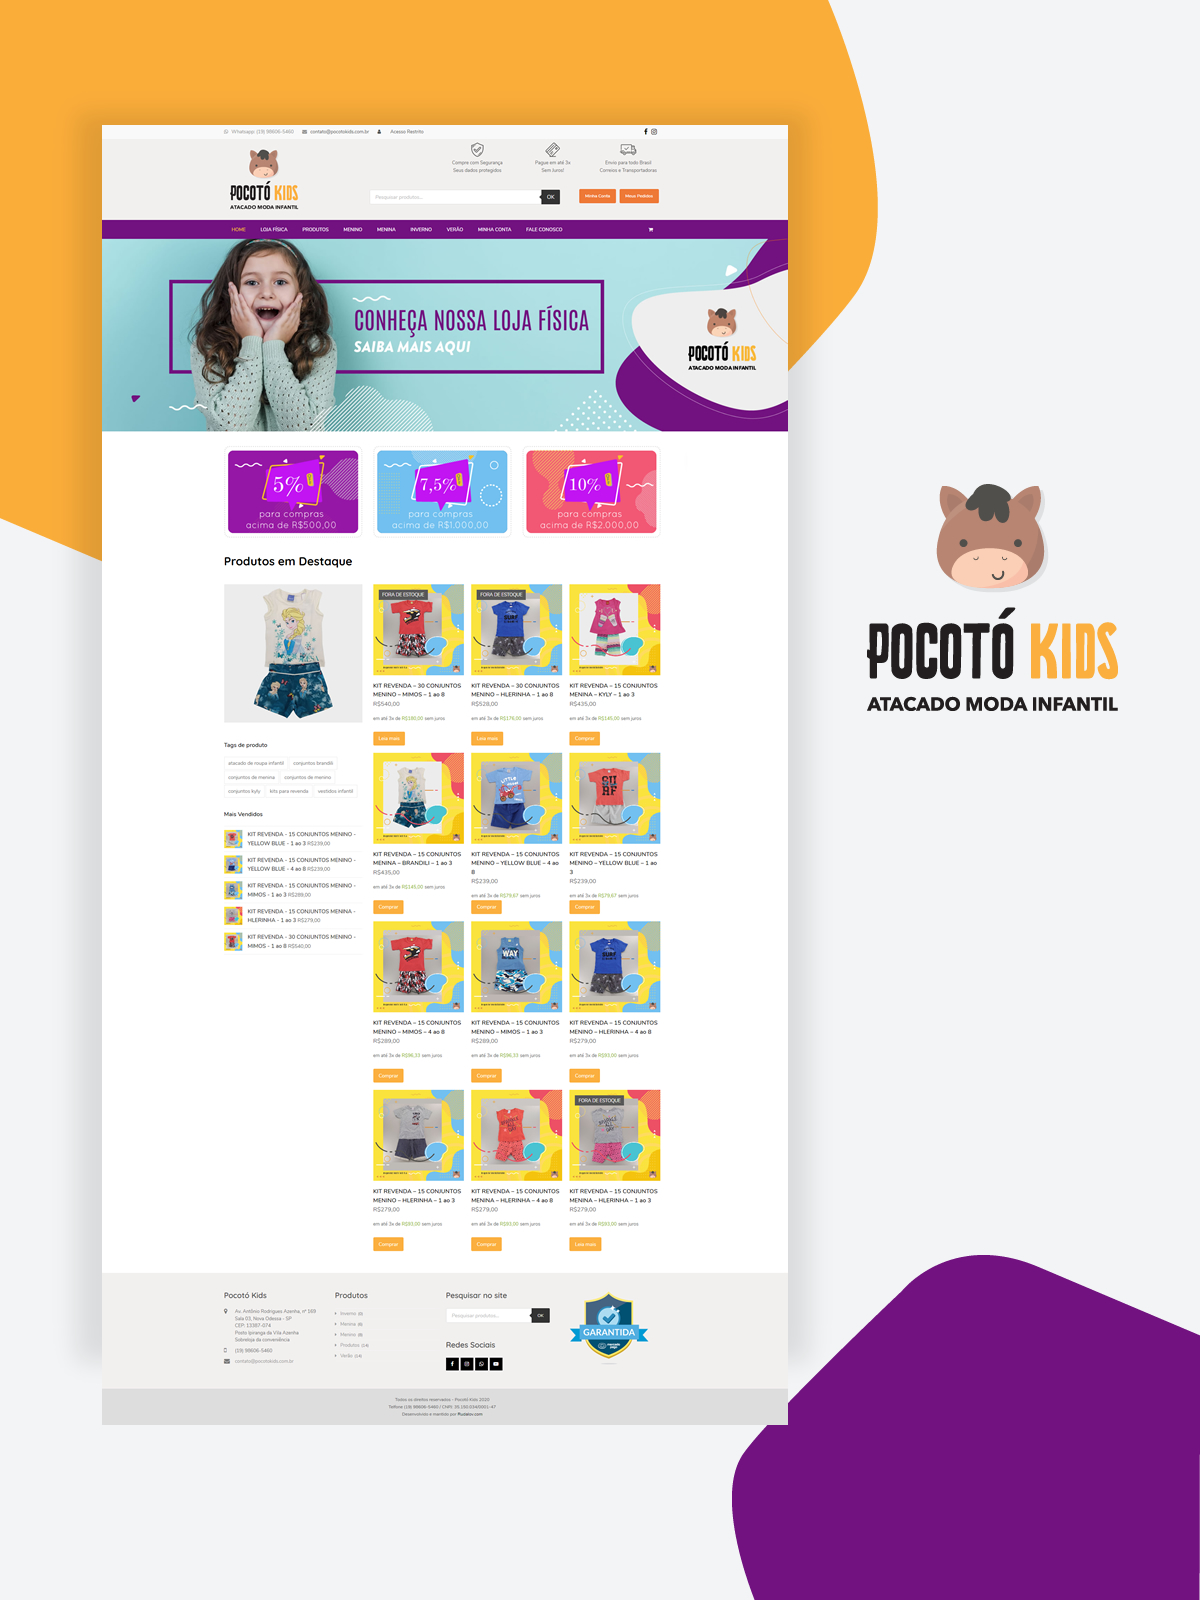 Desenvolvimento do e-commerce Pocotó Kids Moda Infantil